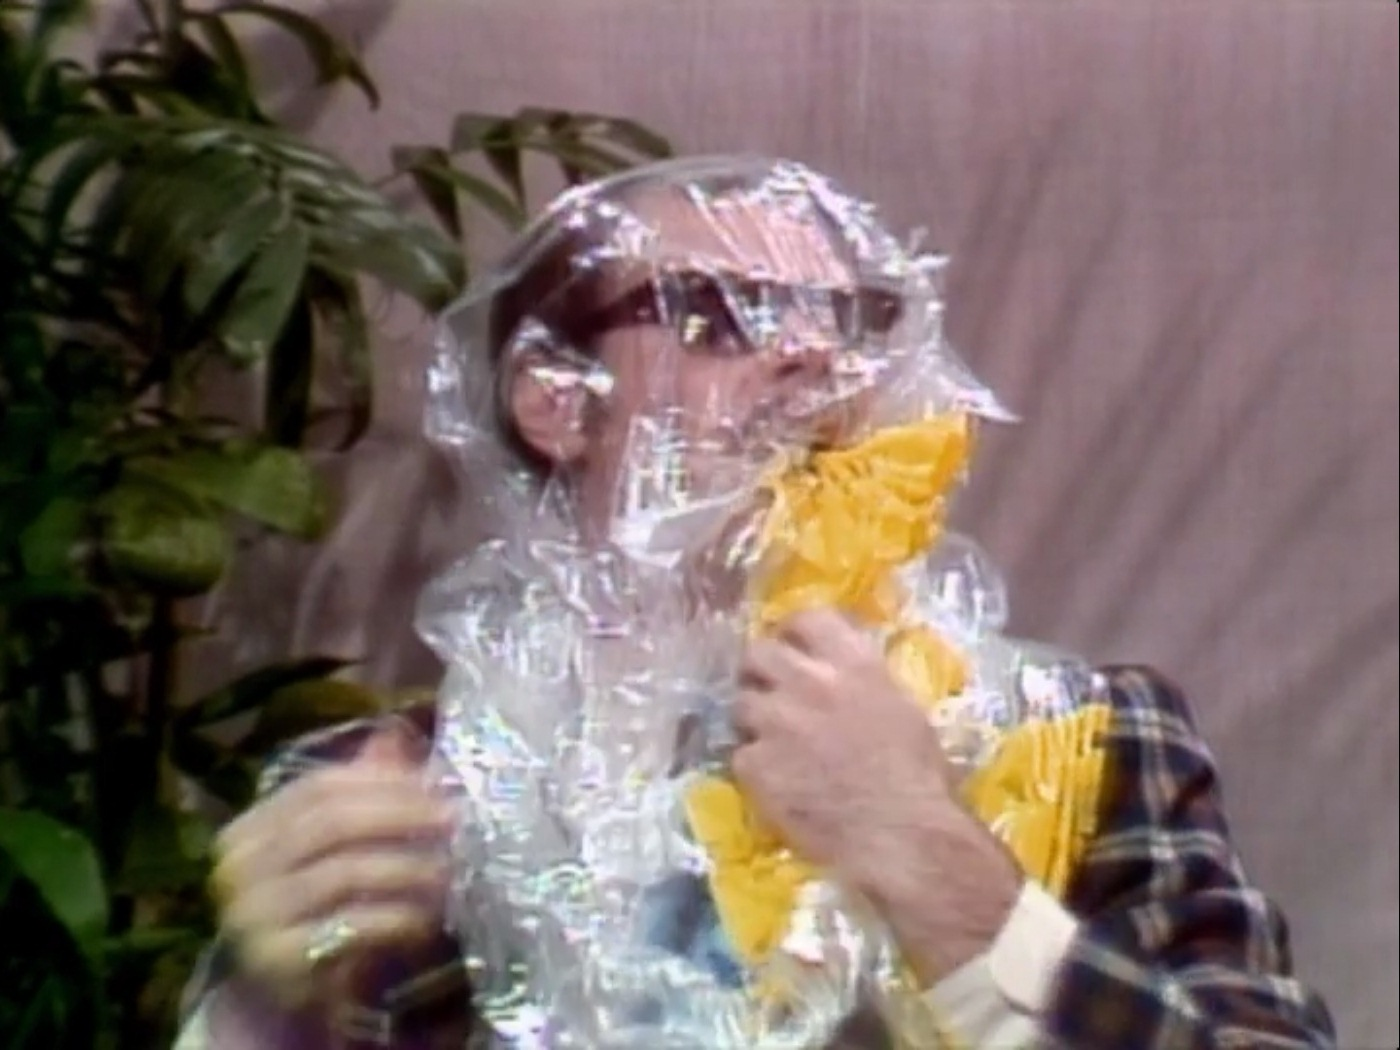 52 Best SNL images | Saturday night live, Snl, Celebrities